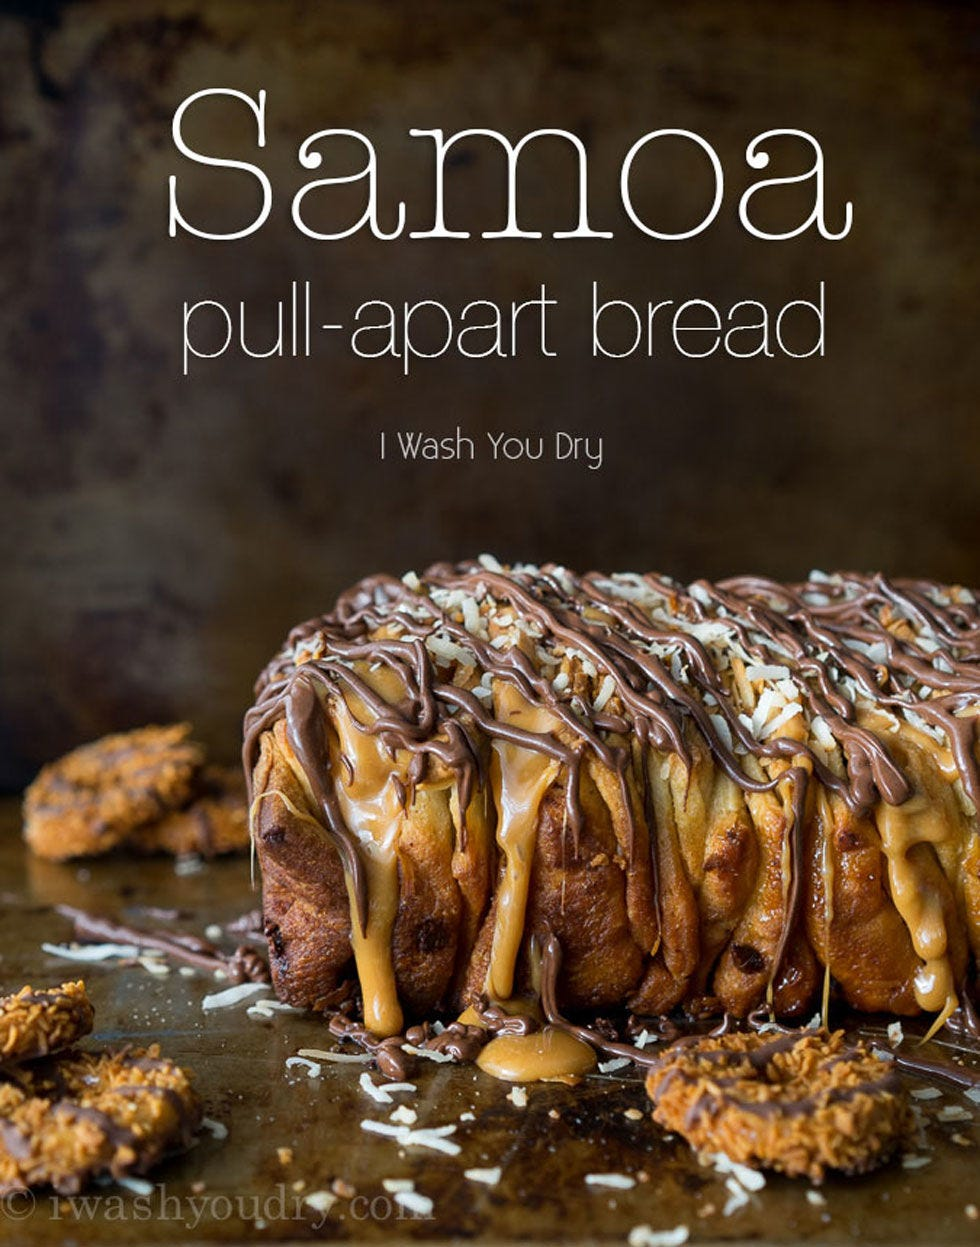 Samoa-Pull-Apart-Bread